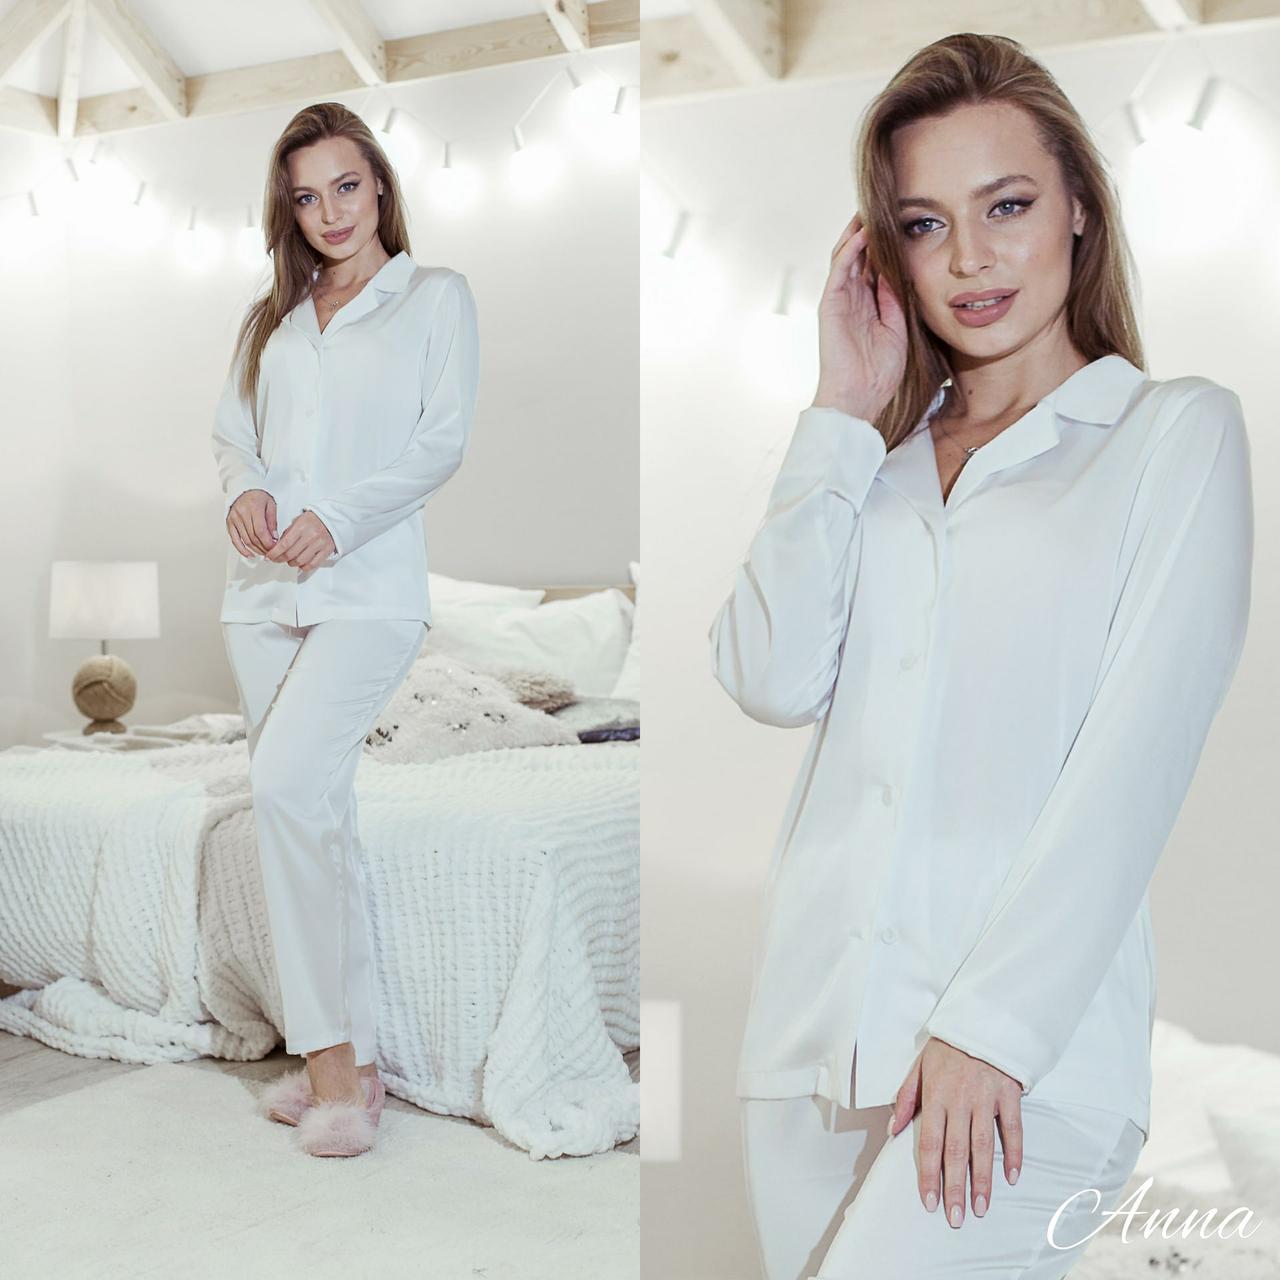 Шелковая женская брючная пижама с рубашкой на пуговицах 641976